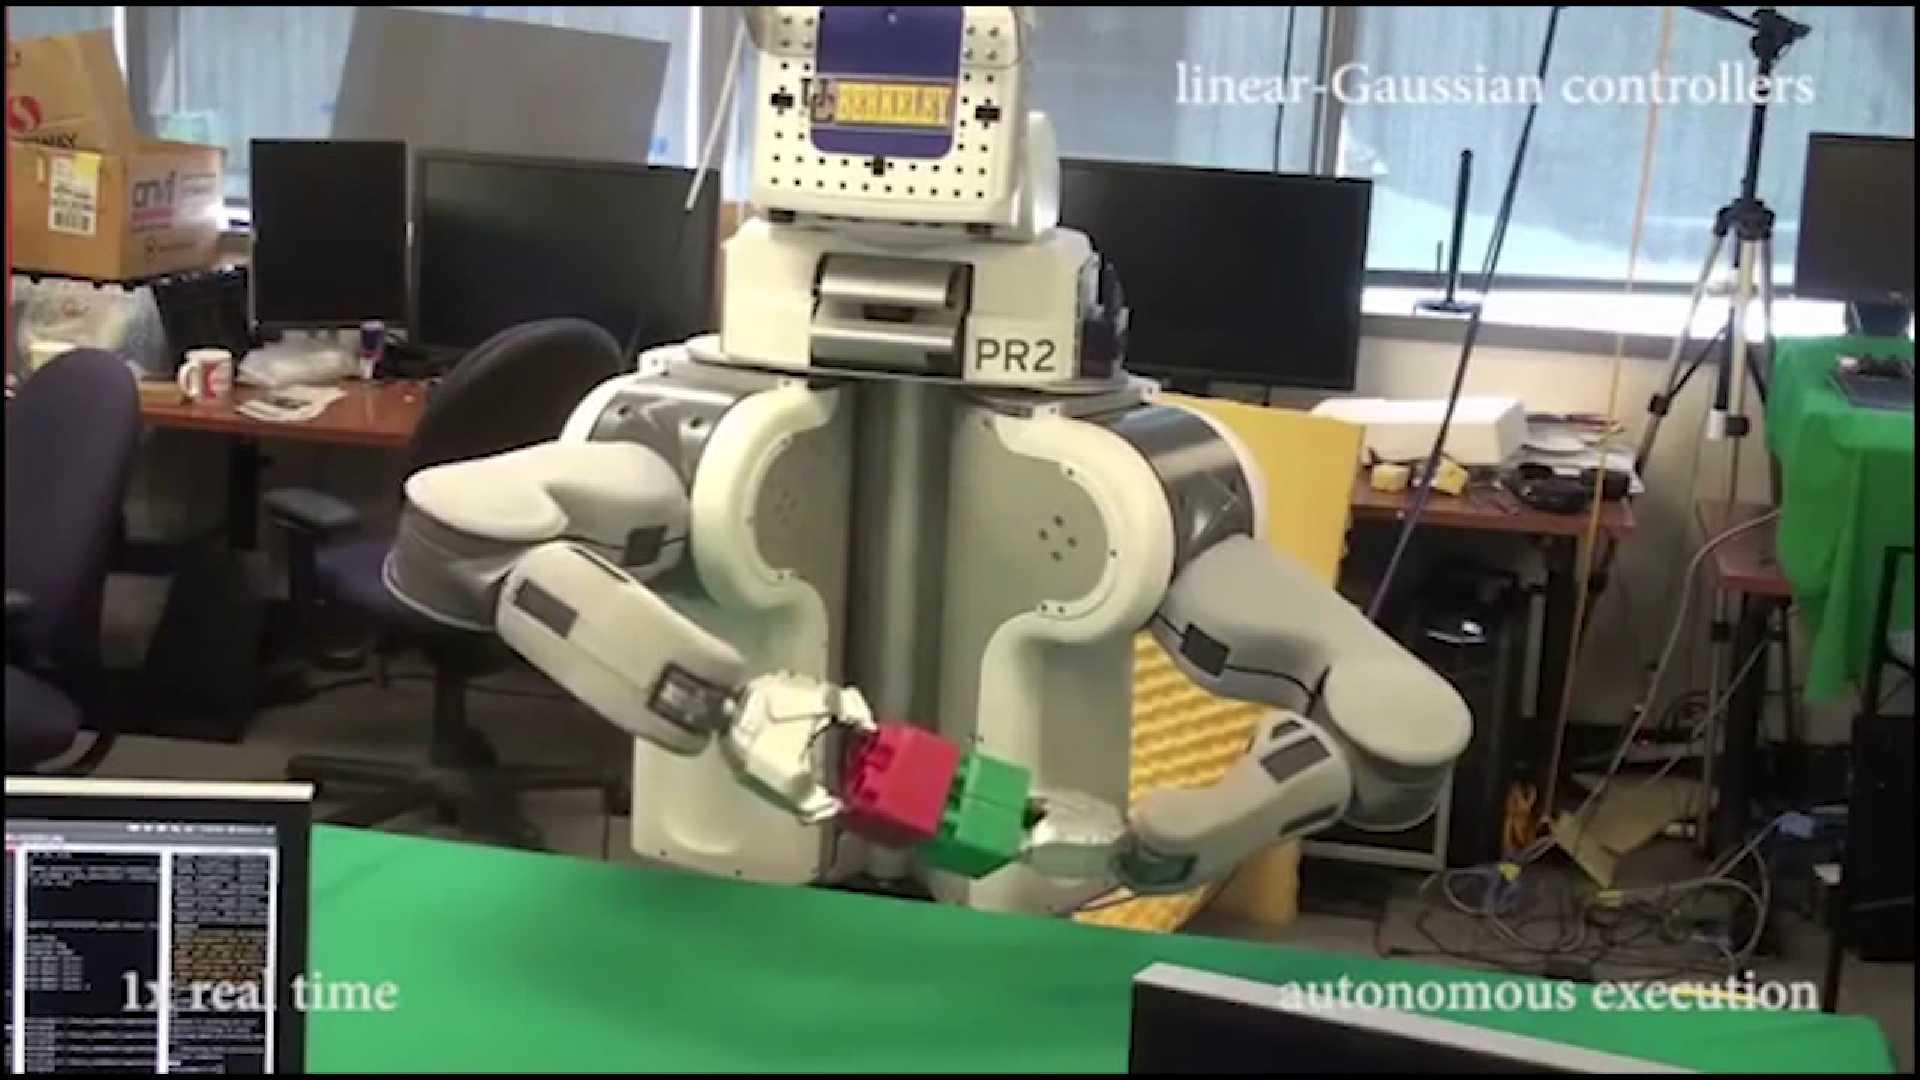 BRETT-The-Robot